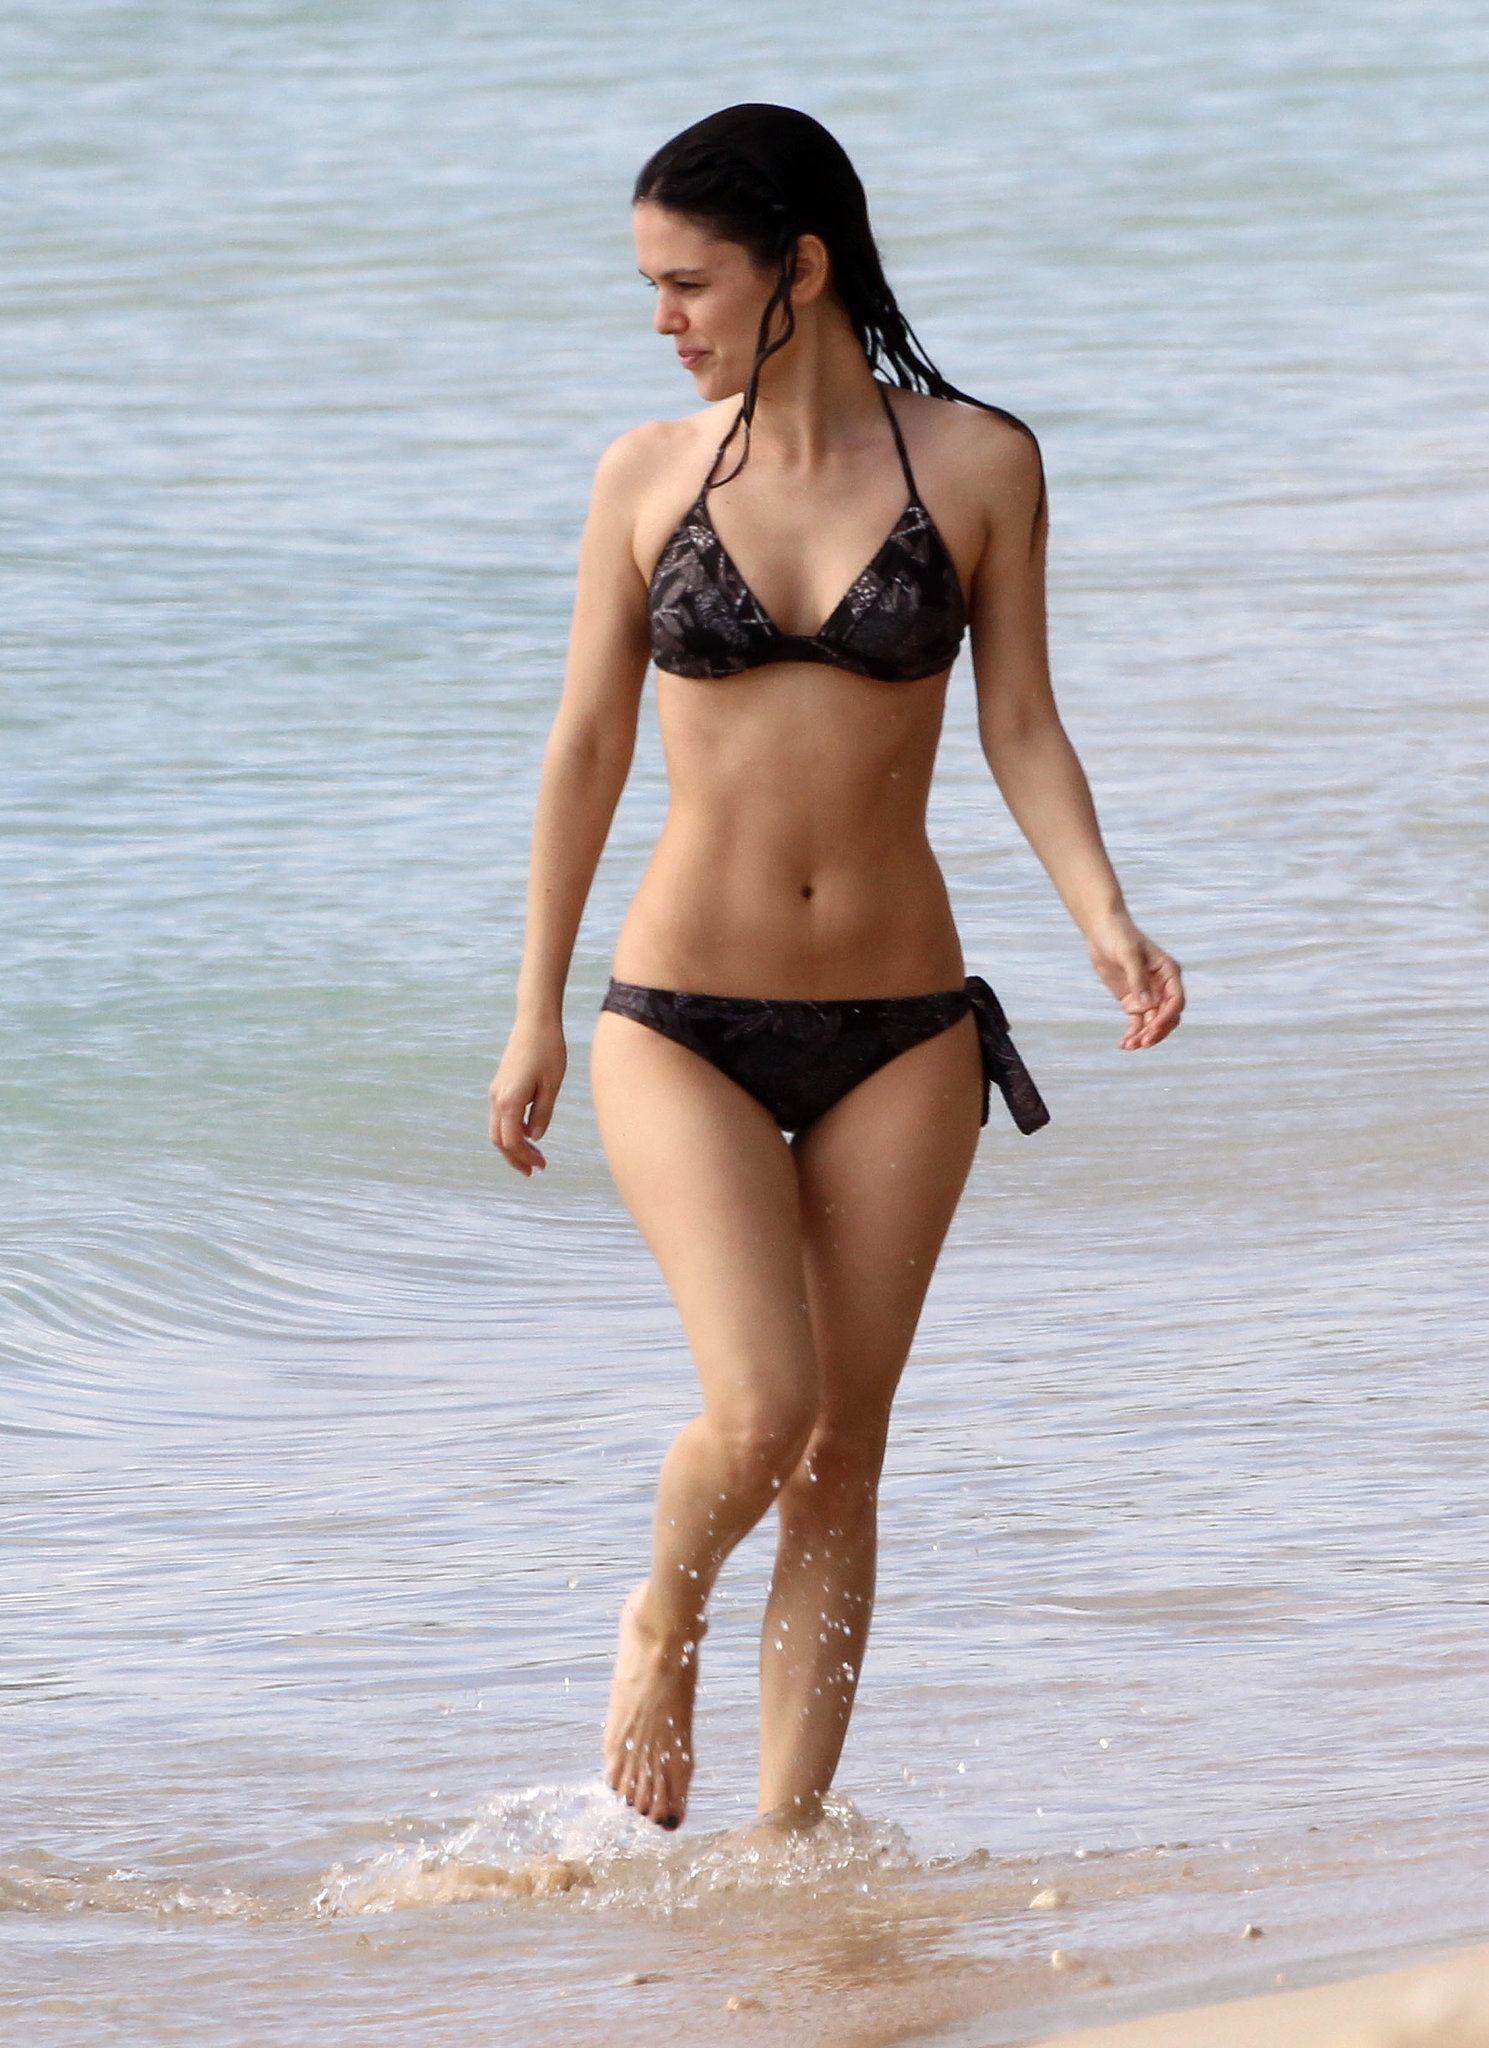 Rachel-Bilson-rocked-black-bikini-showed-off-her-toned-abs